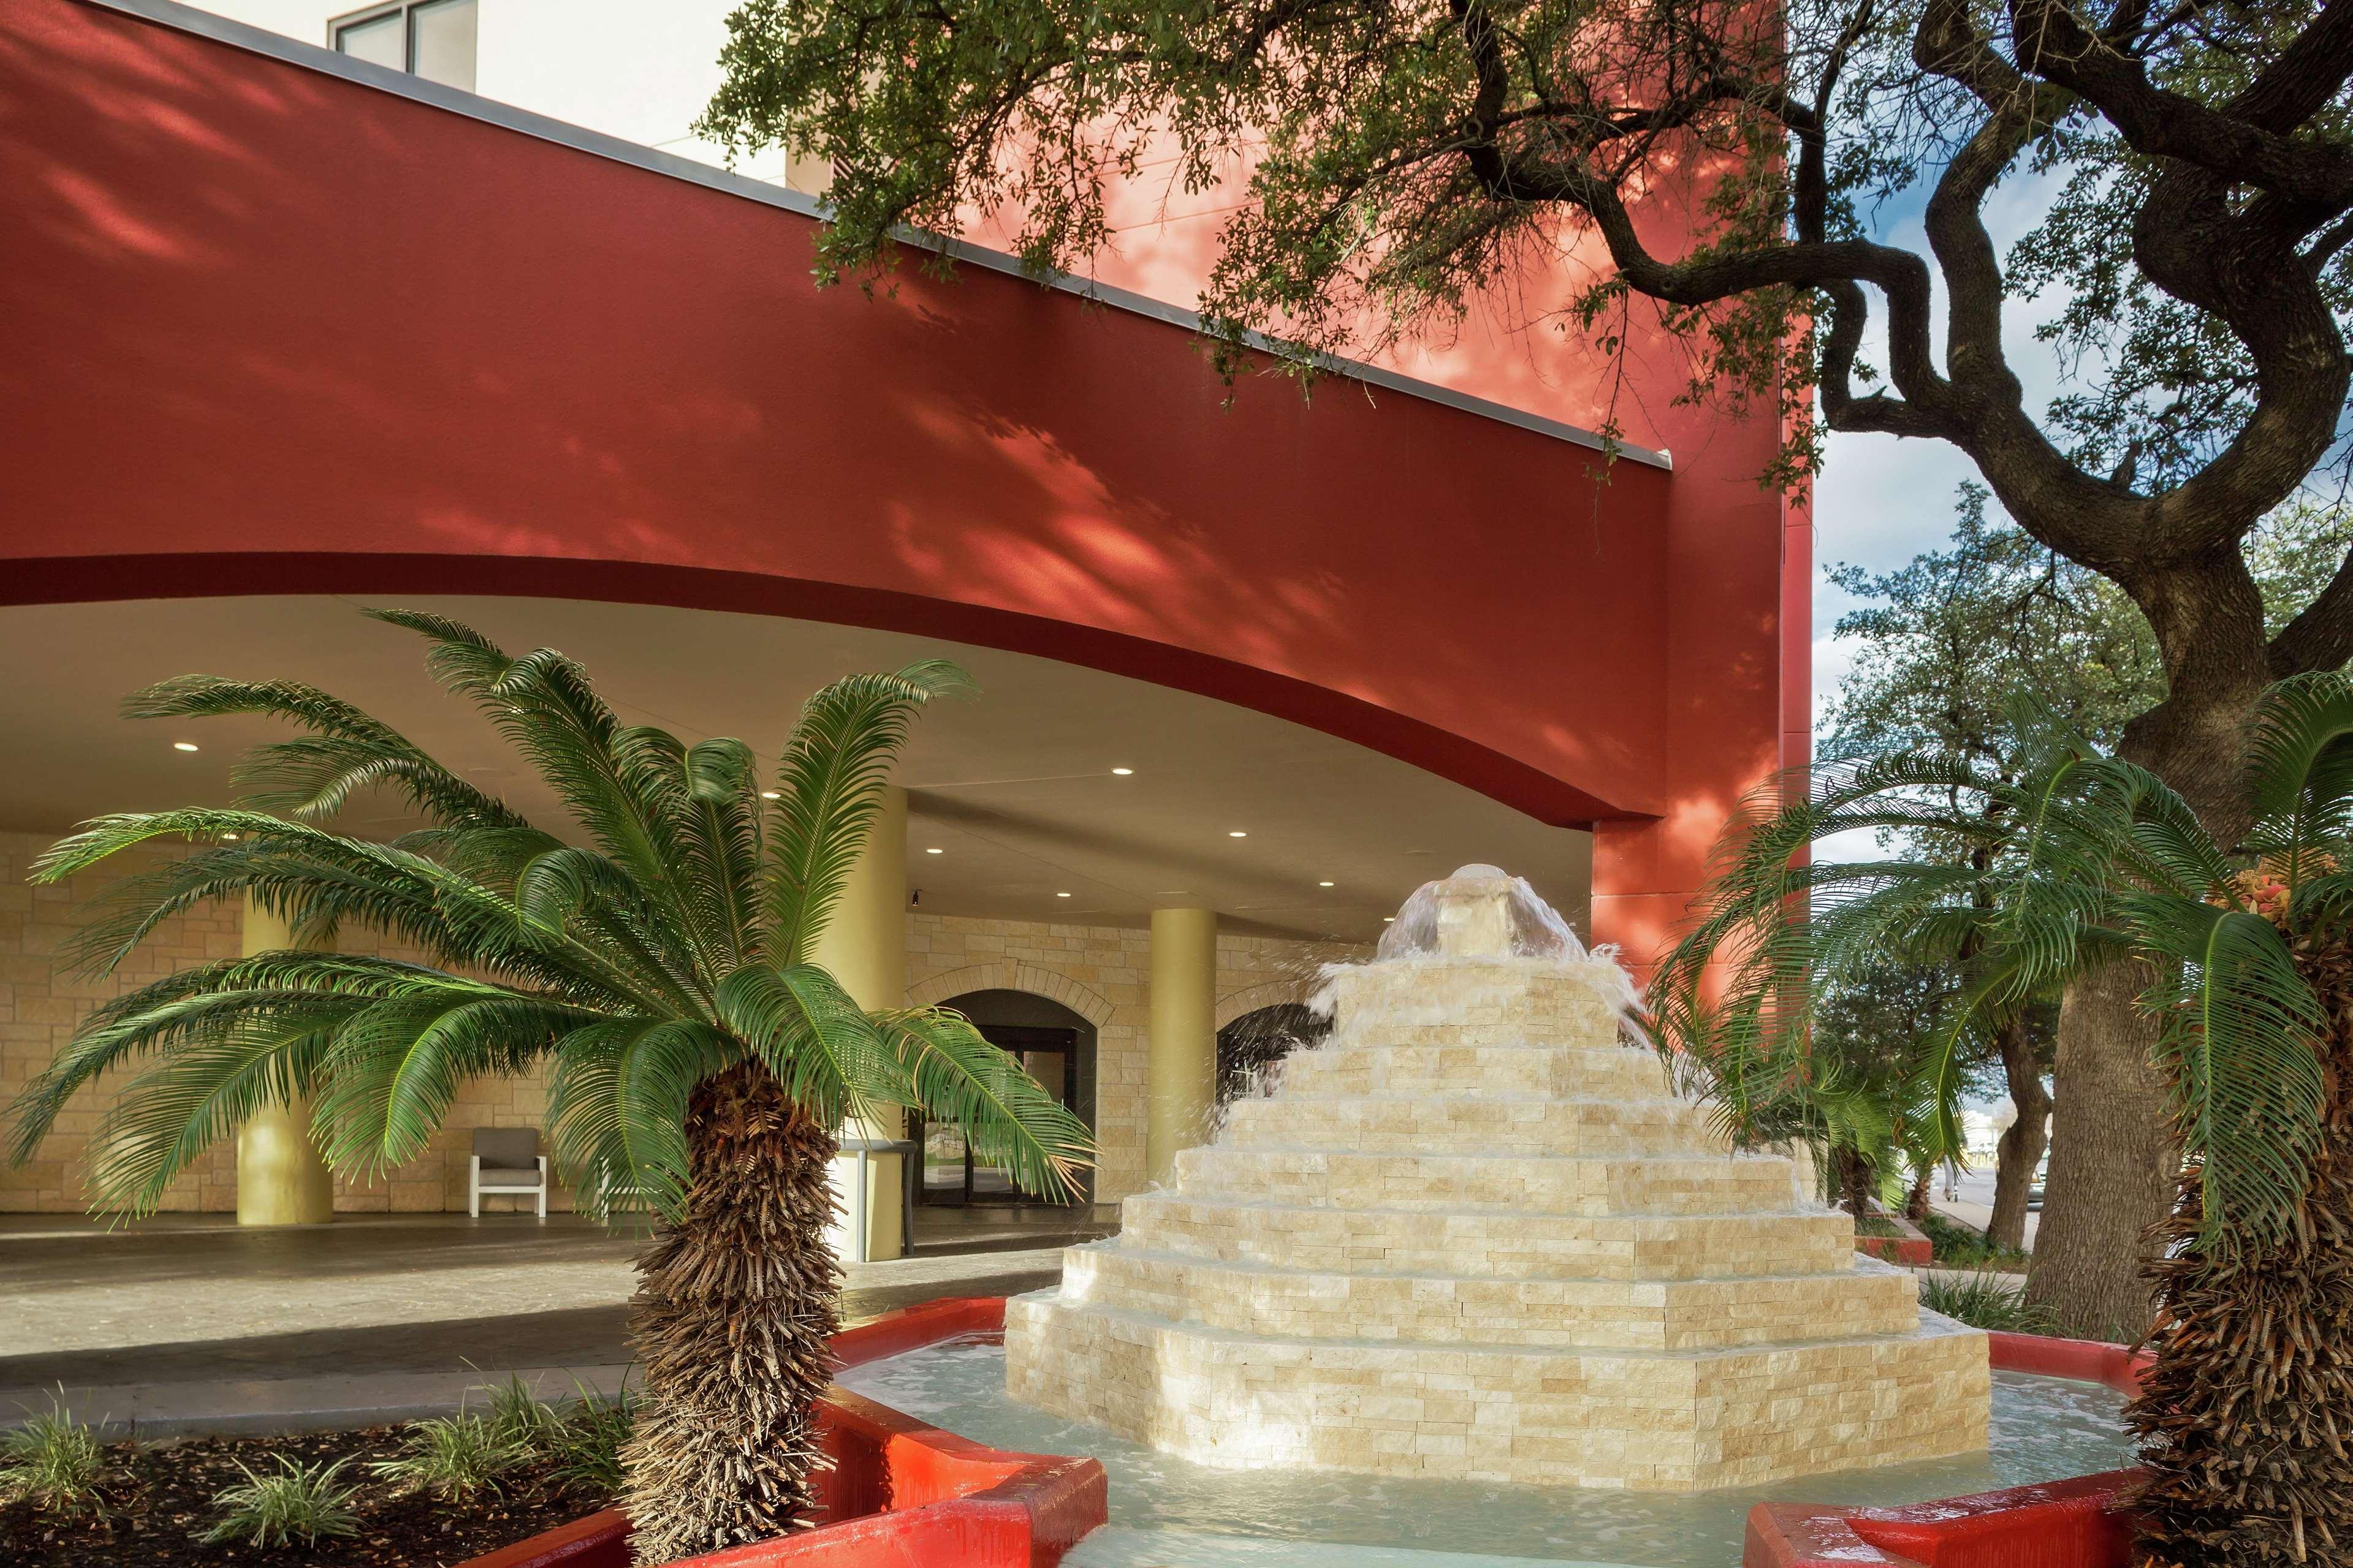 DoubleTree by Hilton Hotel San Antonio Downtown